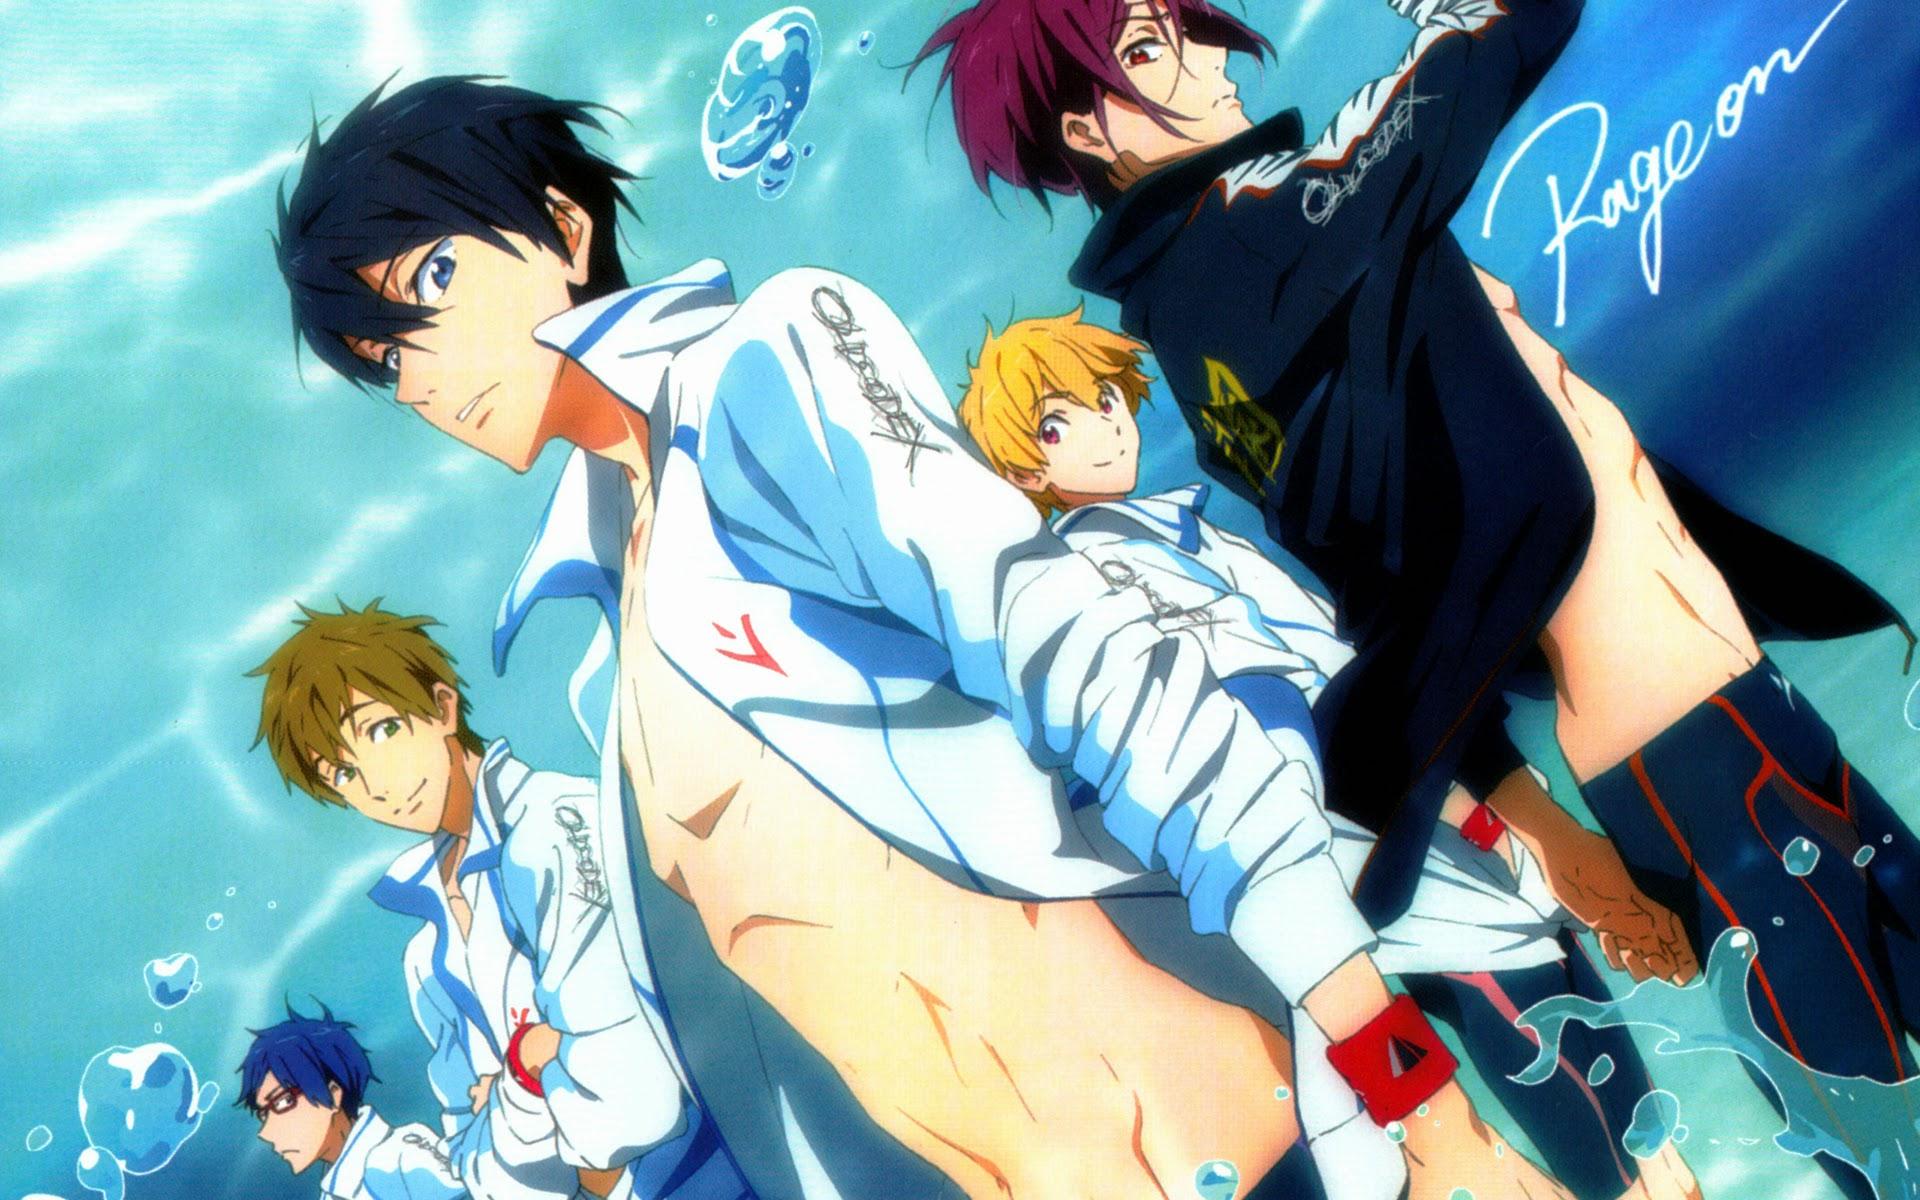 Iwatobi Swim Club Anime Boys characters Nagisa Hazuki Rin 1920x1200